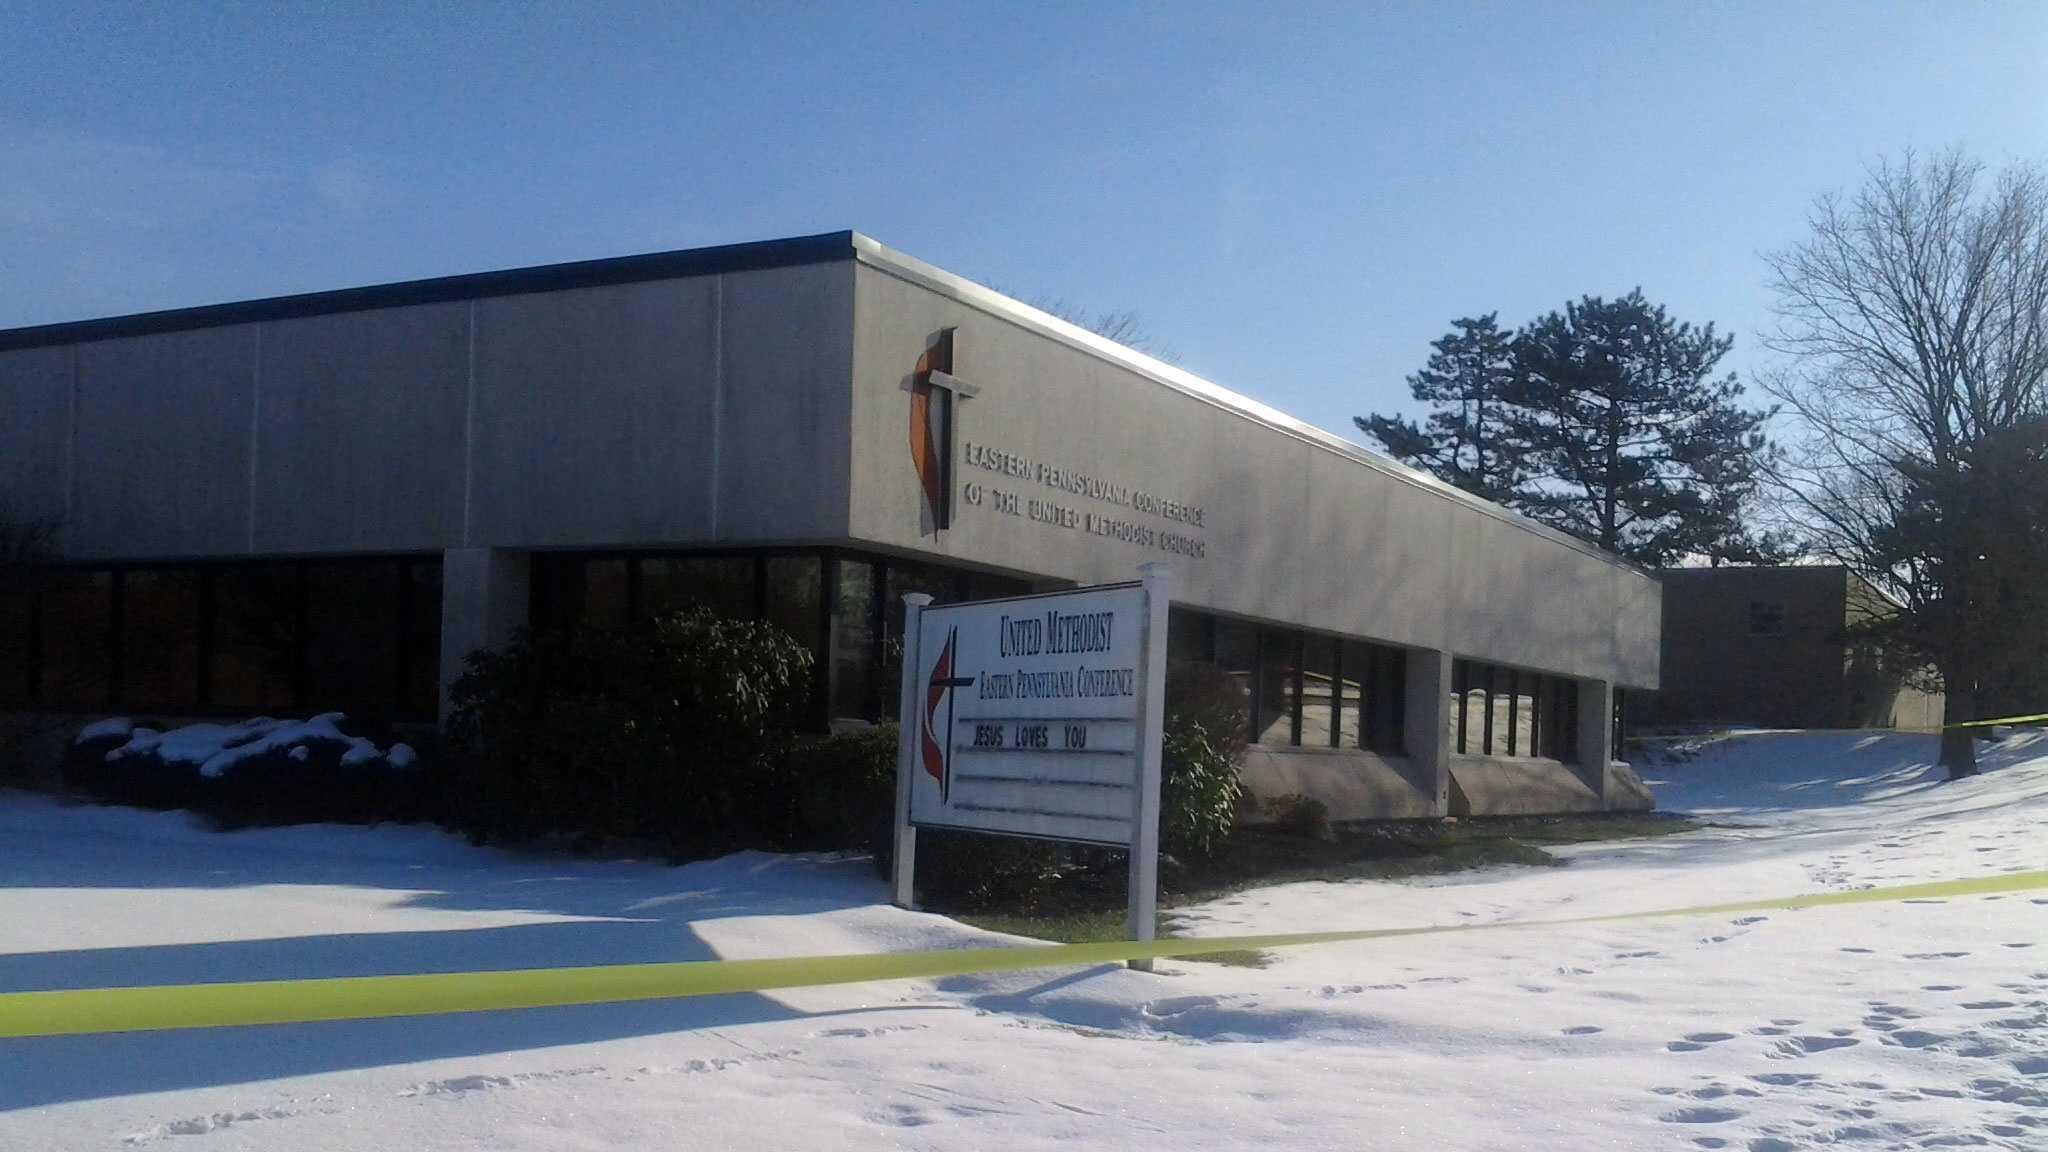 12.19 UMC building